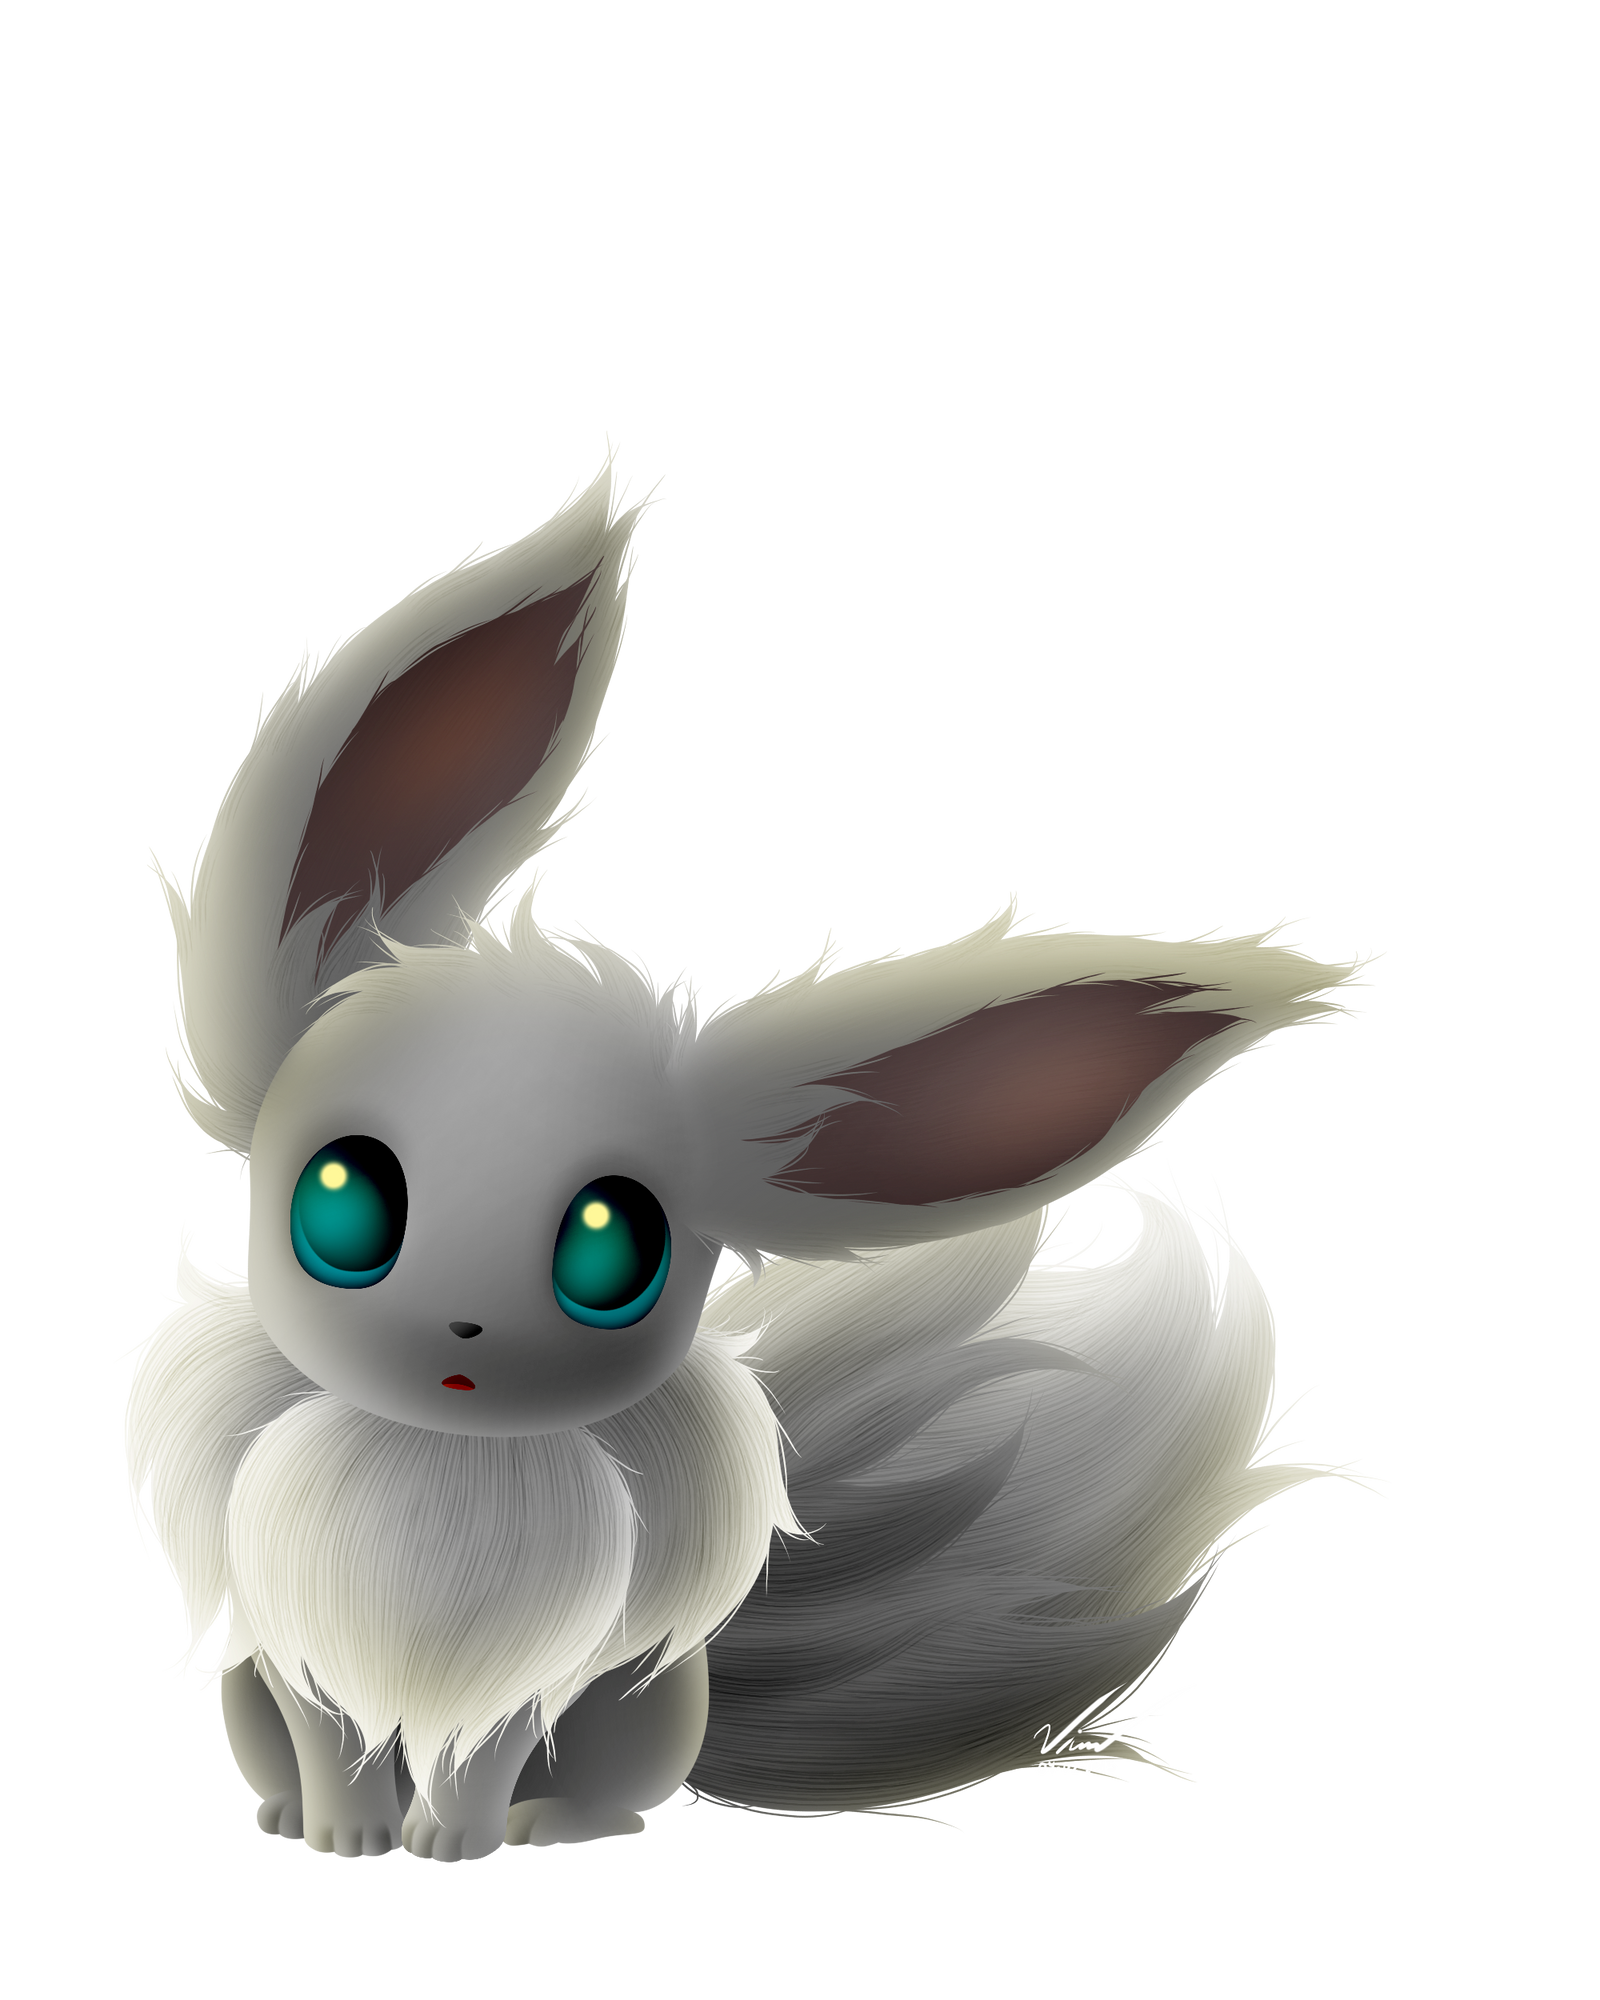 Shiny Eevee by SymbianL on DeviantArt